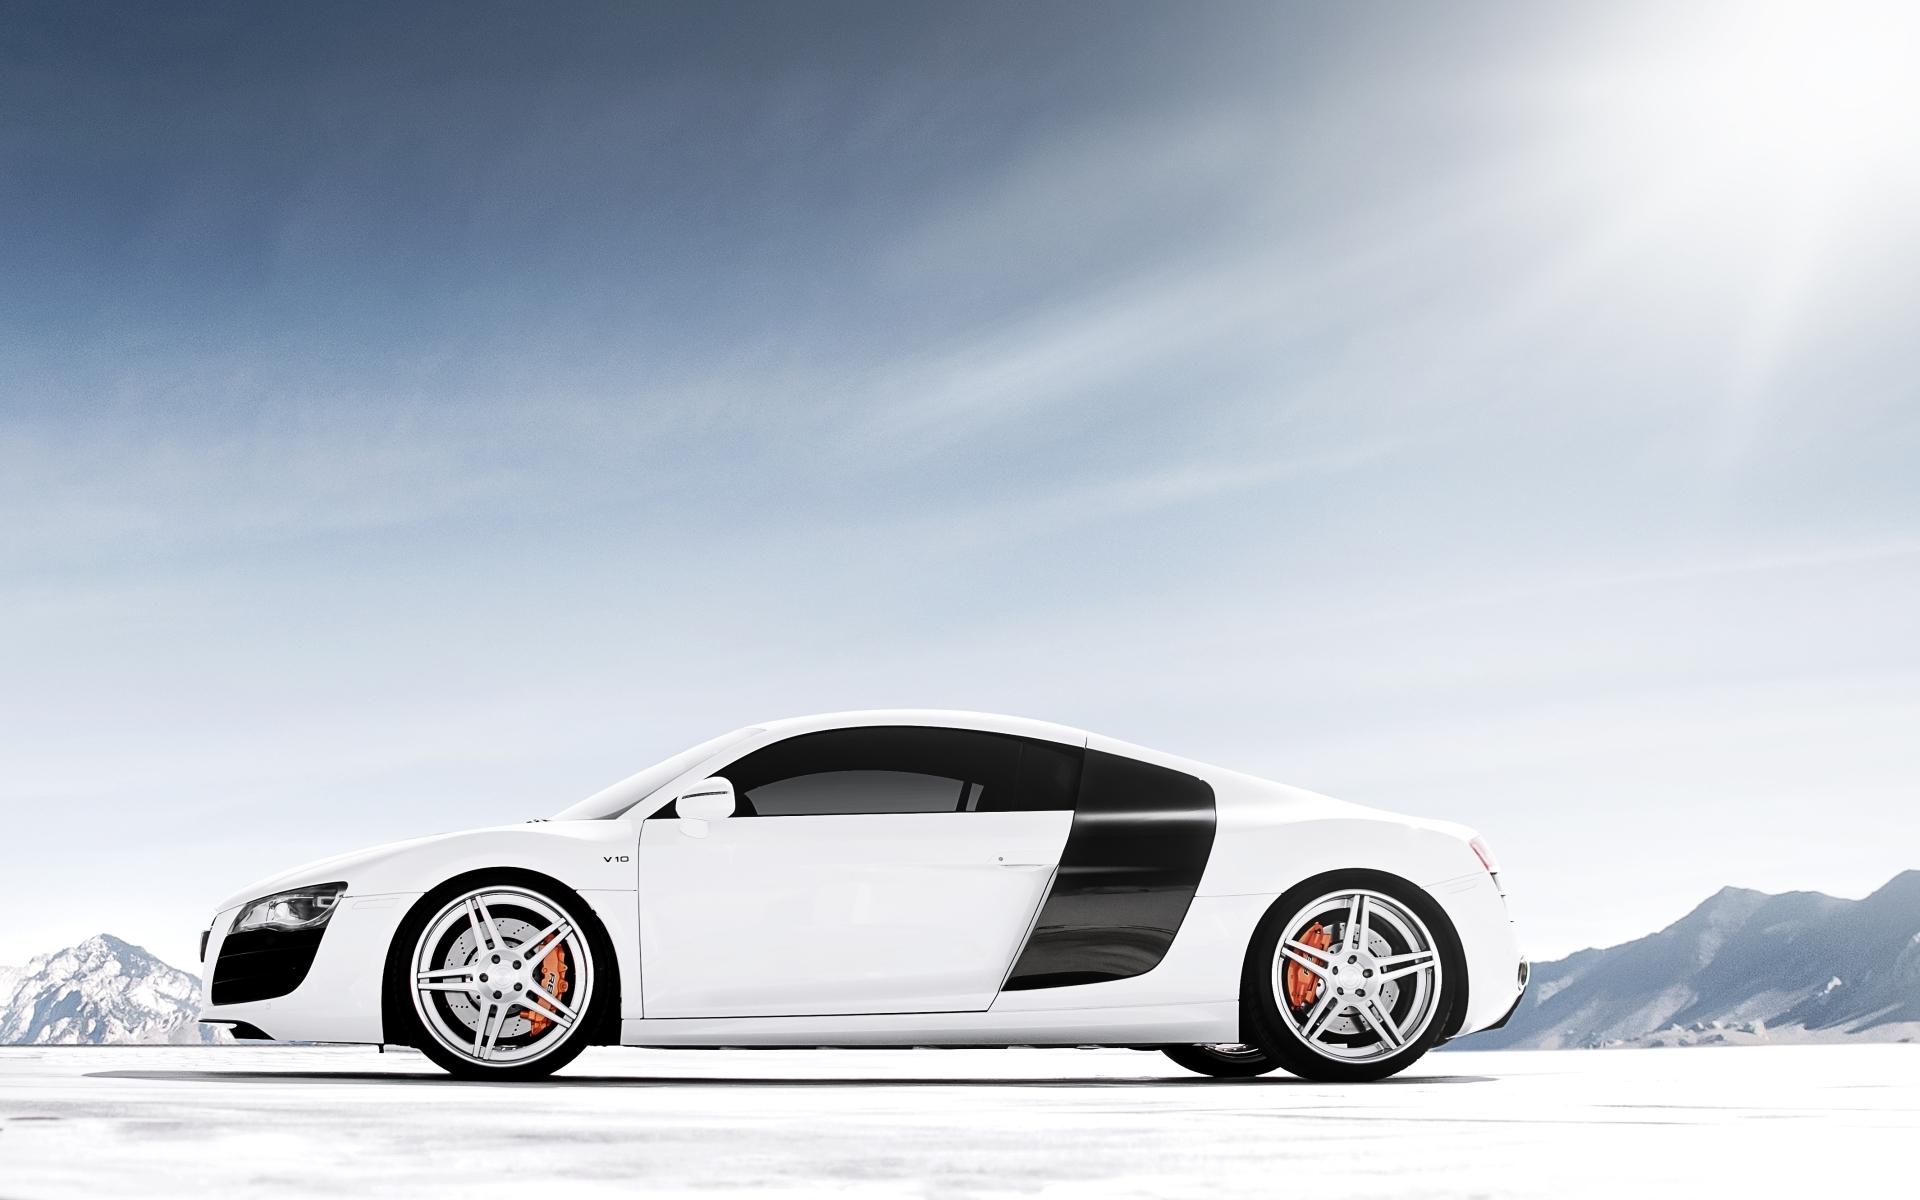 Audi R8 V10 ADV1 Wheels